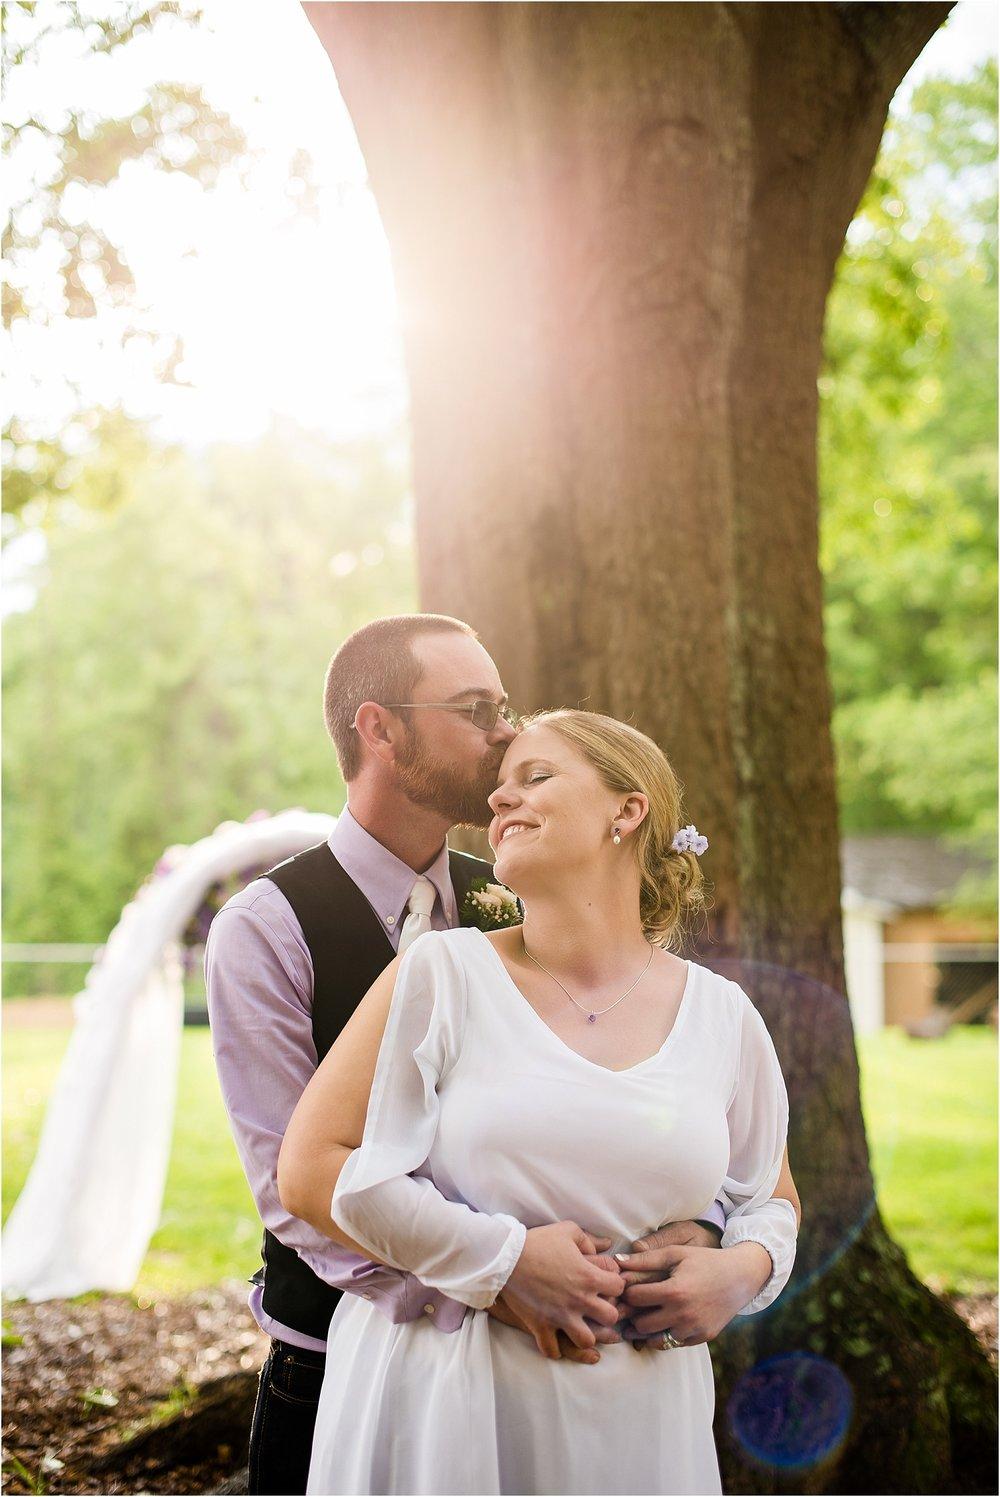 Destination-Wedding-New-England-Golden-Hour-Bride-Groom-Modern-Wedding-Portraits